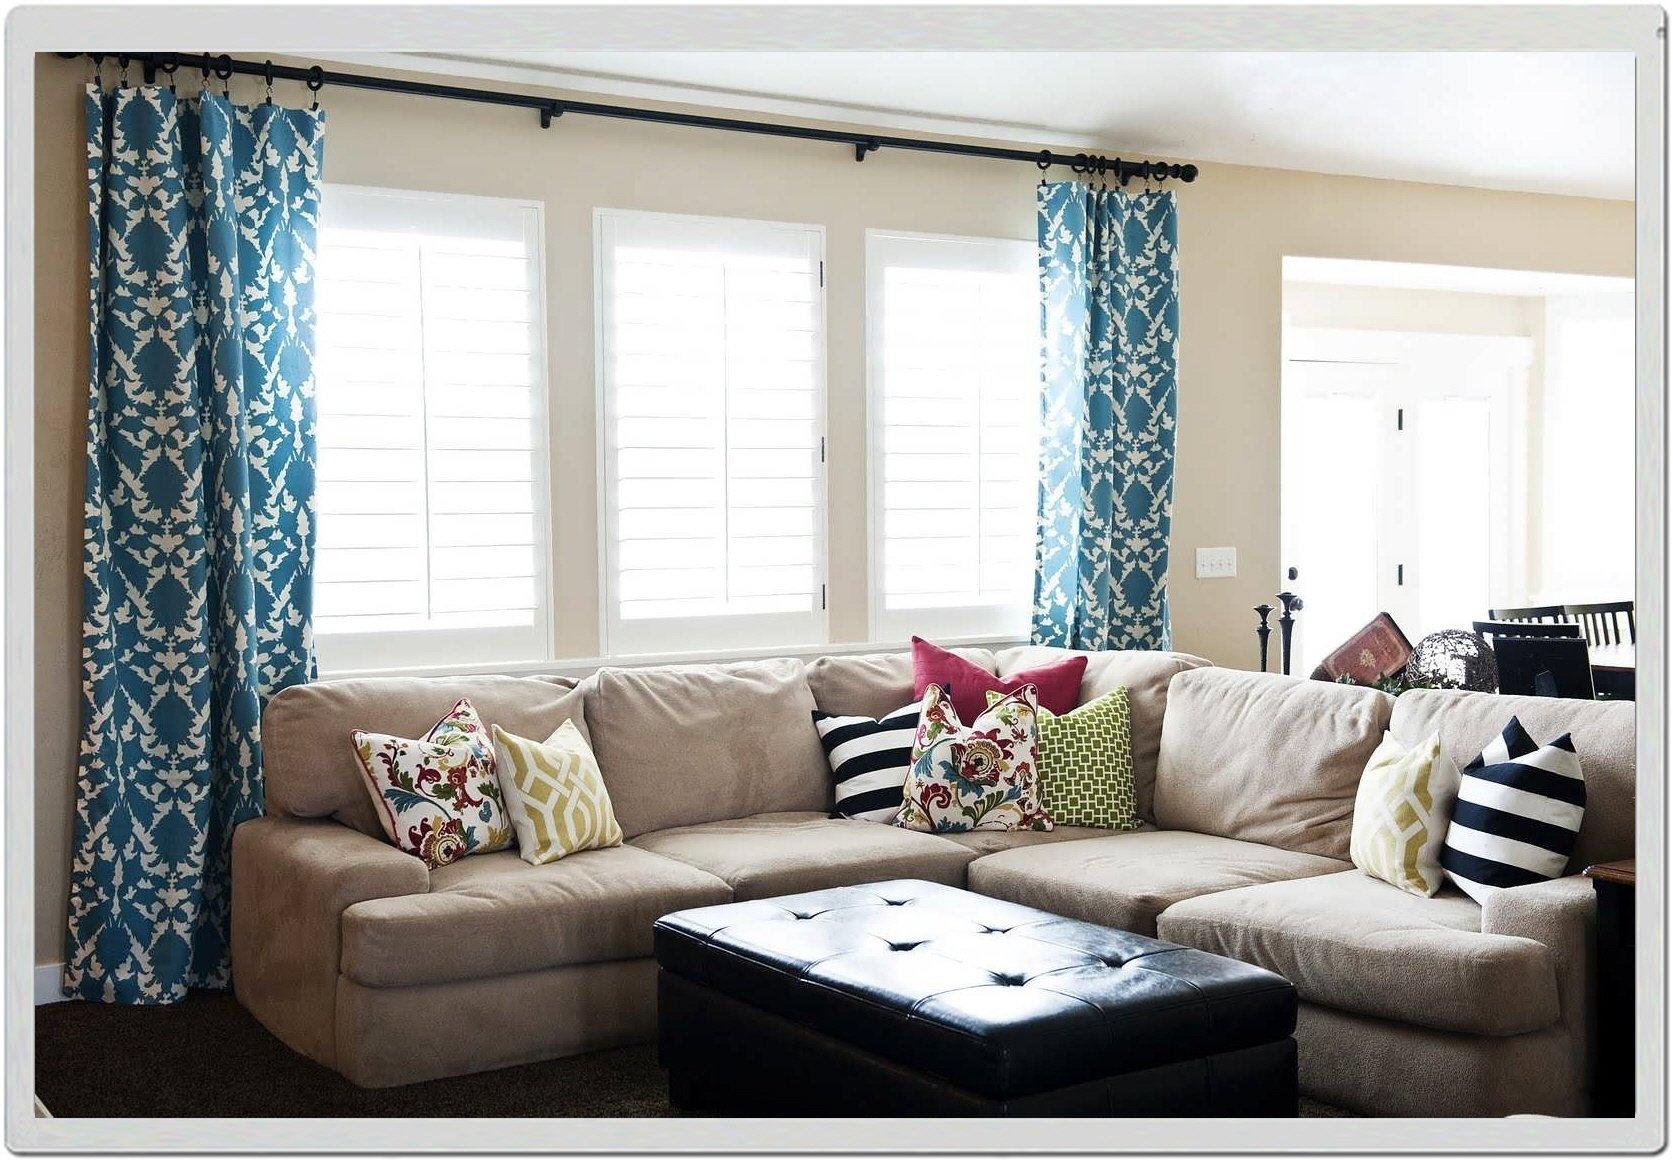 10 Cute Living Room Window Treatment Ideas livingroom curtain ideas for small living room window treatment 2021